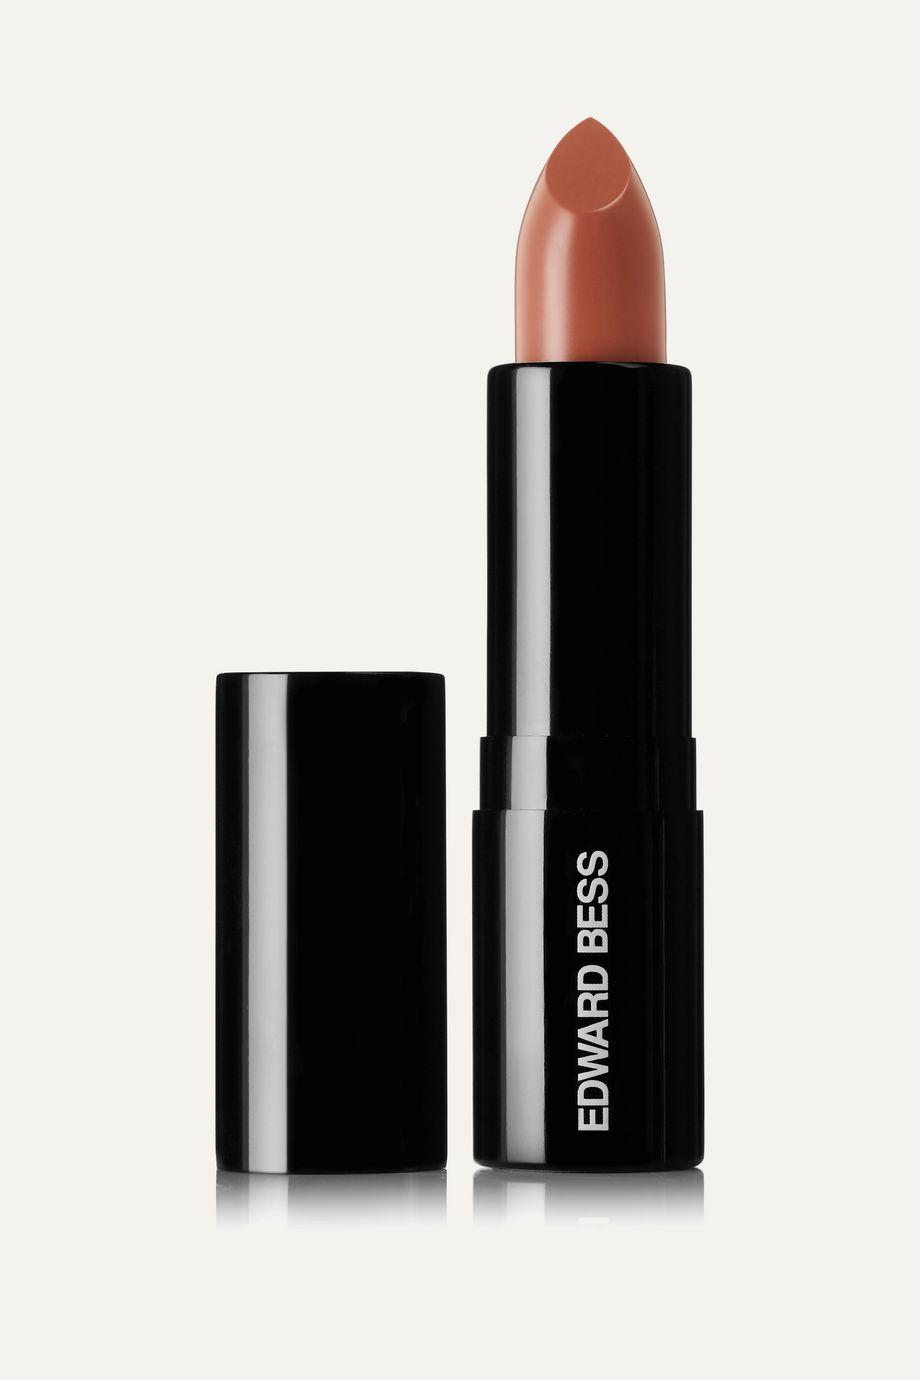 Edward Bess Ultra Slick Lipstick - Pure Impulse